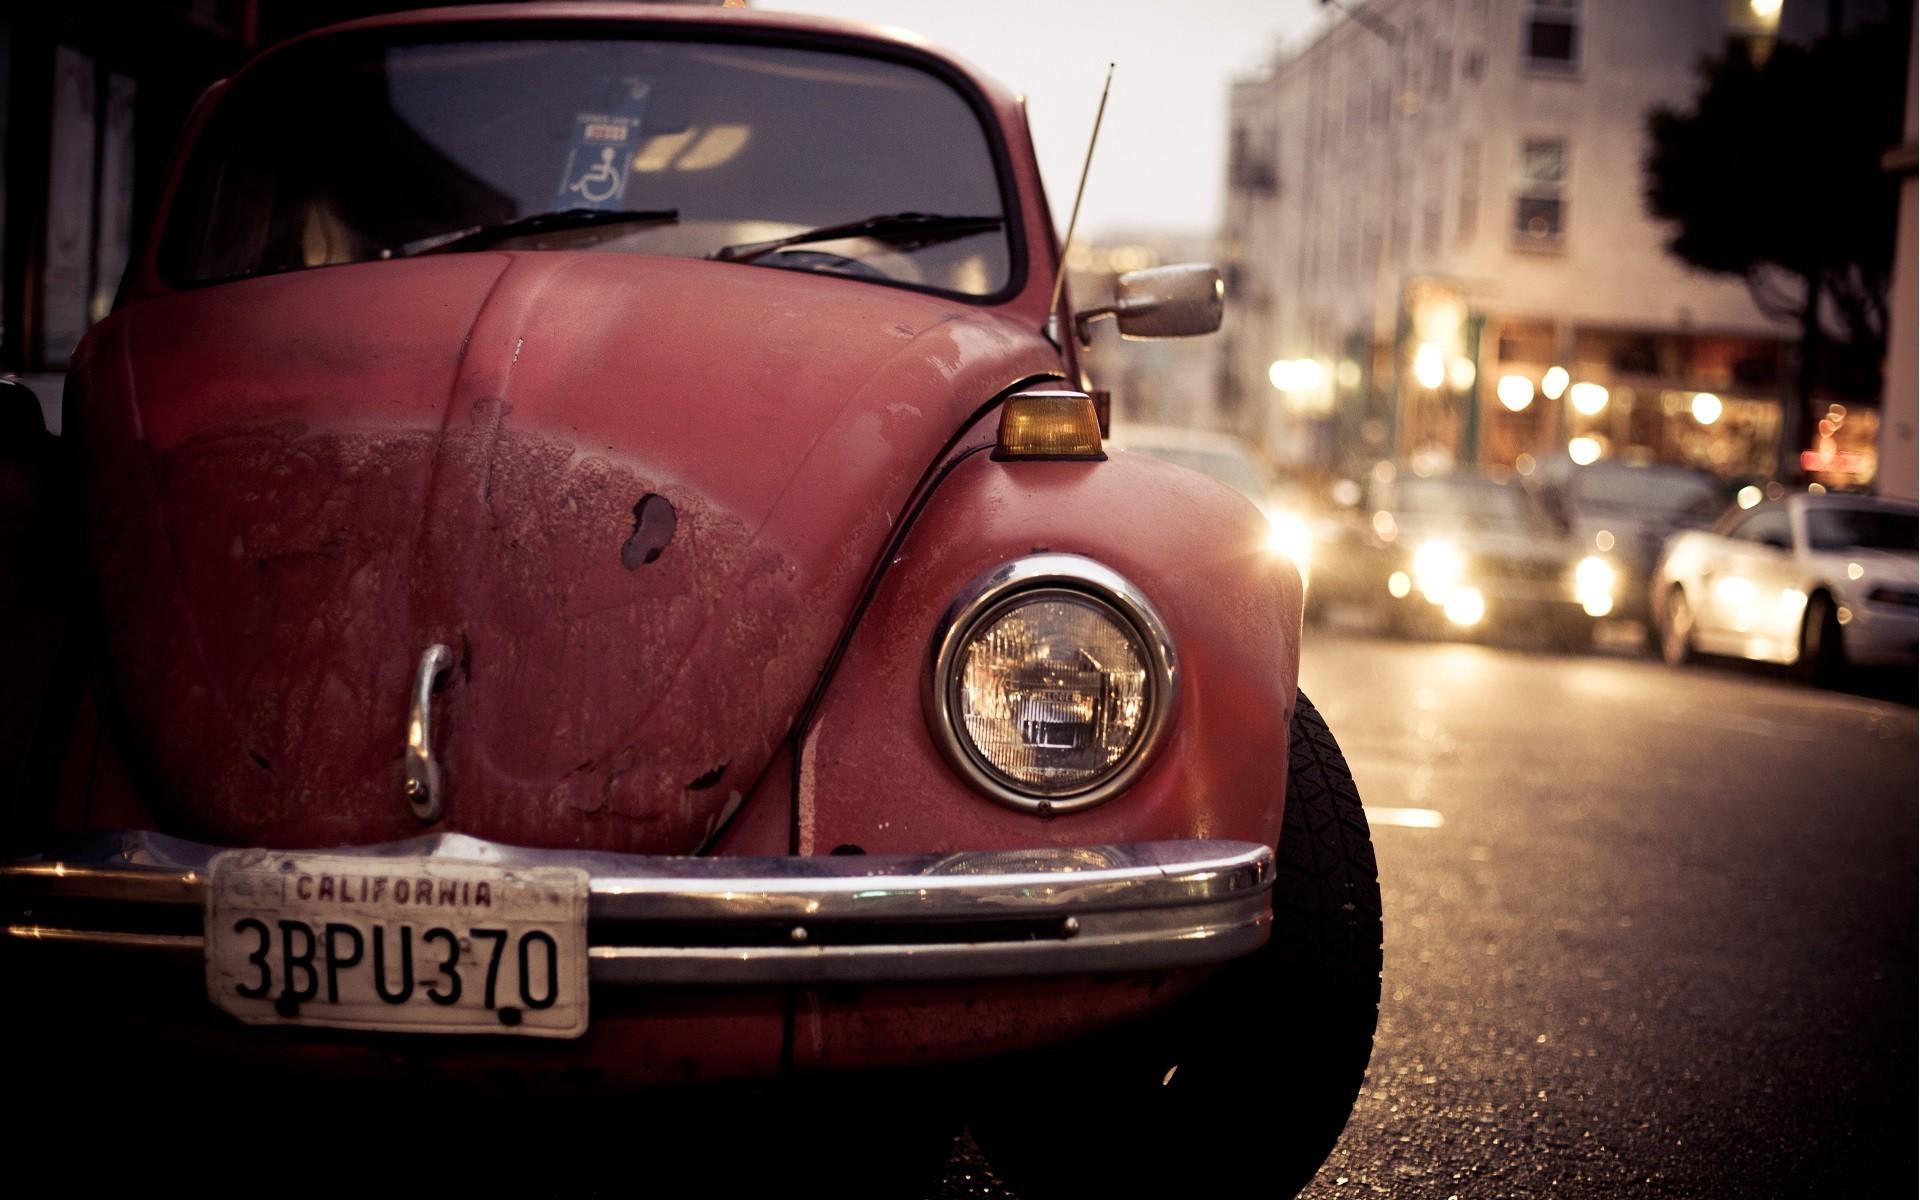 VW Beetle Wallpaper HD (72+ Images